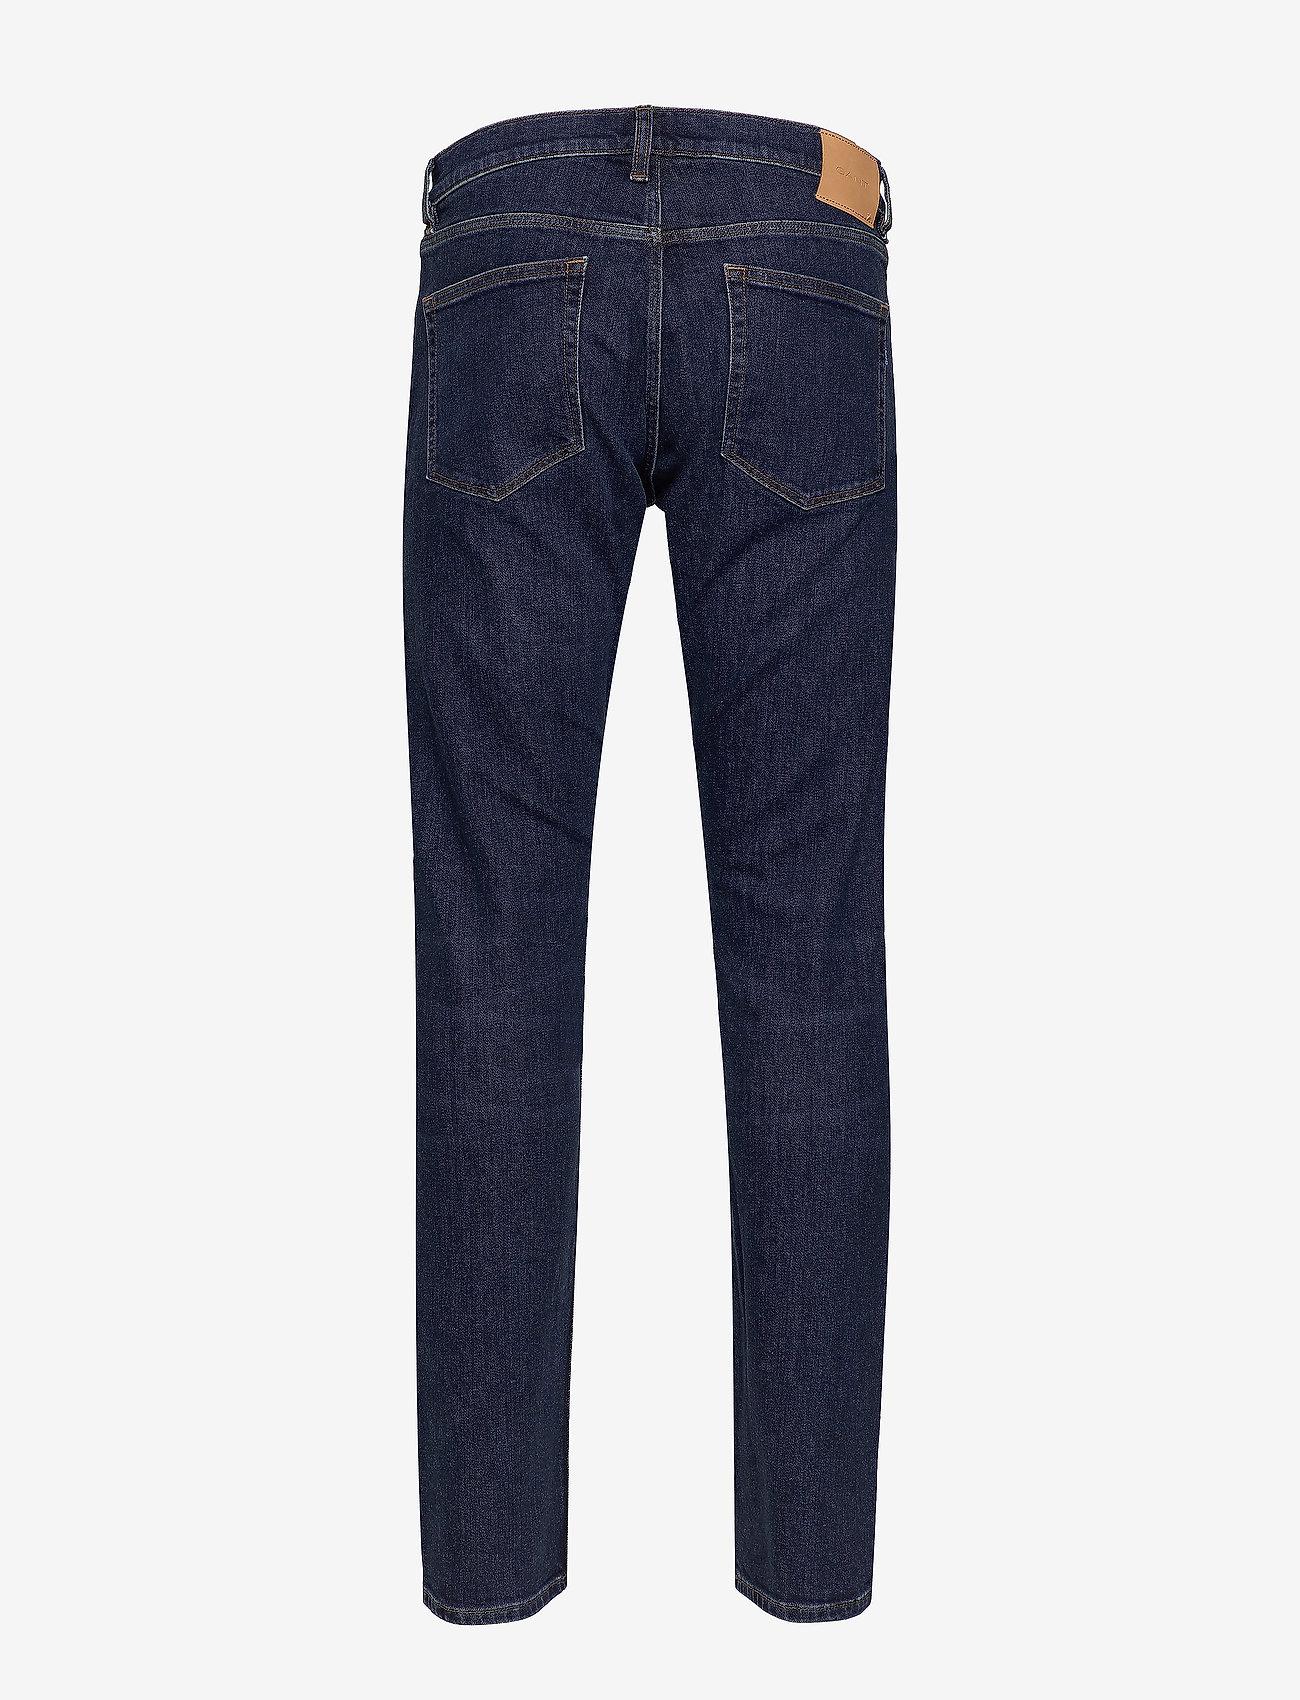 GANT - D1. TAPERED GANT JEANS - slim jeans - dark blue worn in - 1